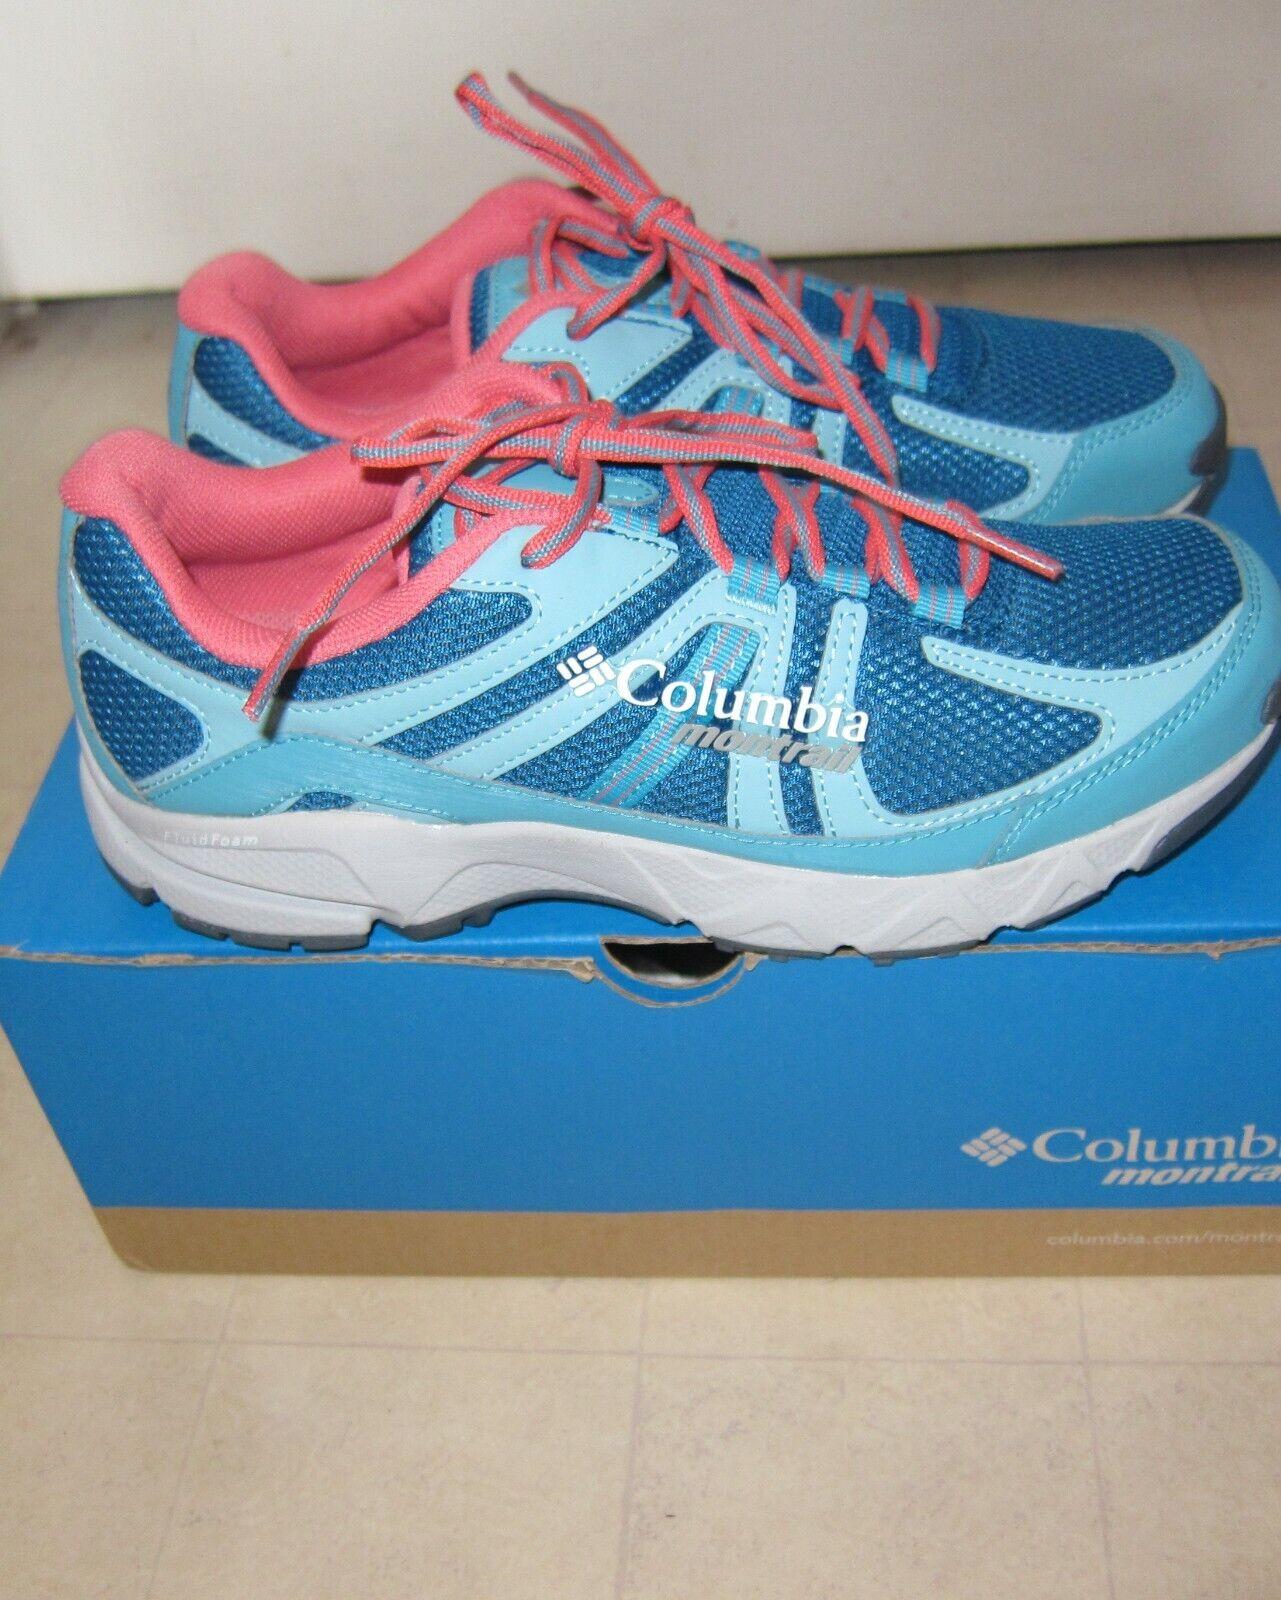 Columbia Monrail Bighorn Canyon Women Shoes Phoenix Blue Sz